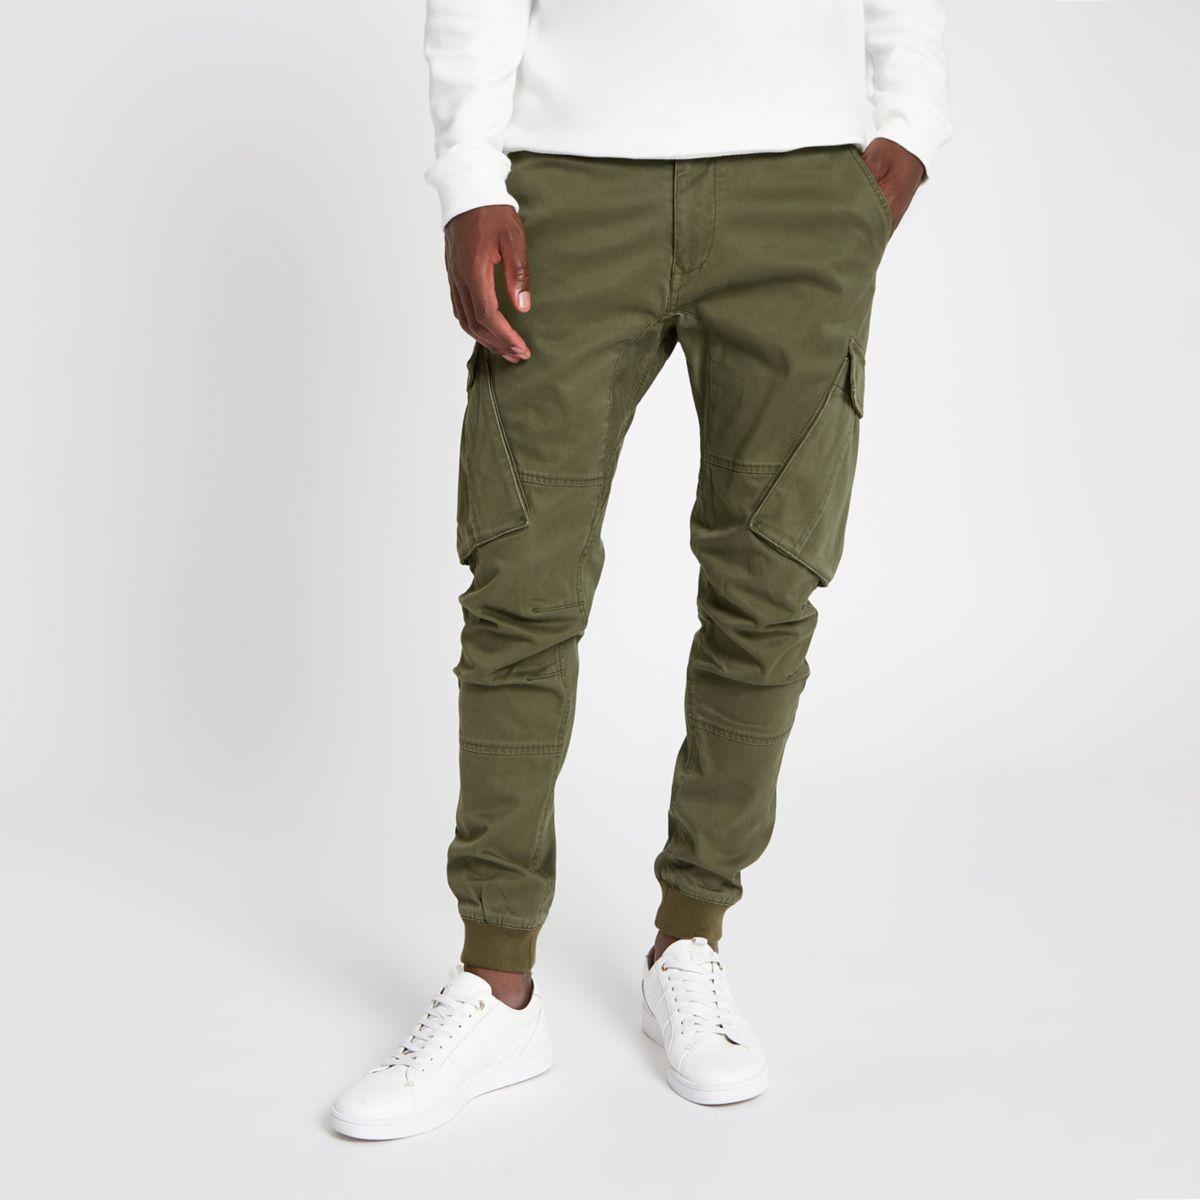 Khaki green tapered cargo pants